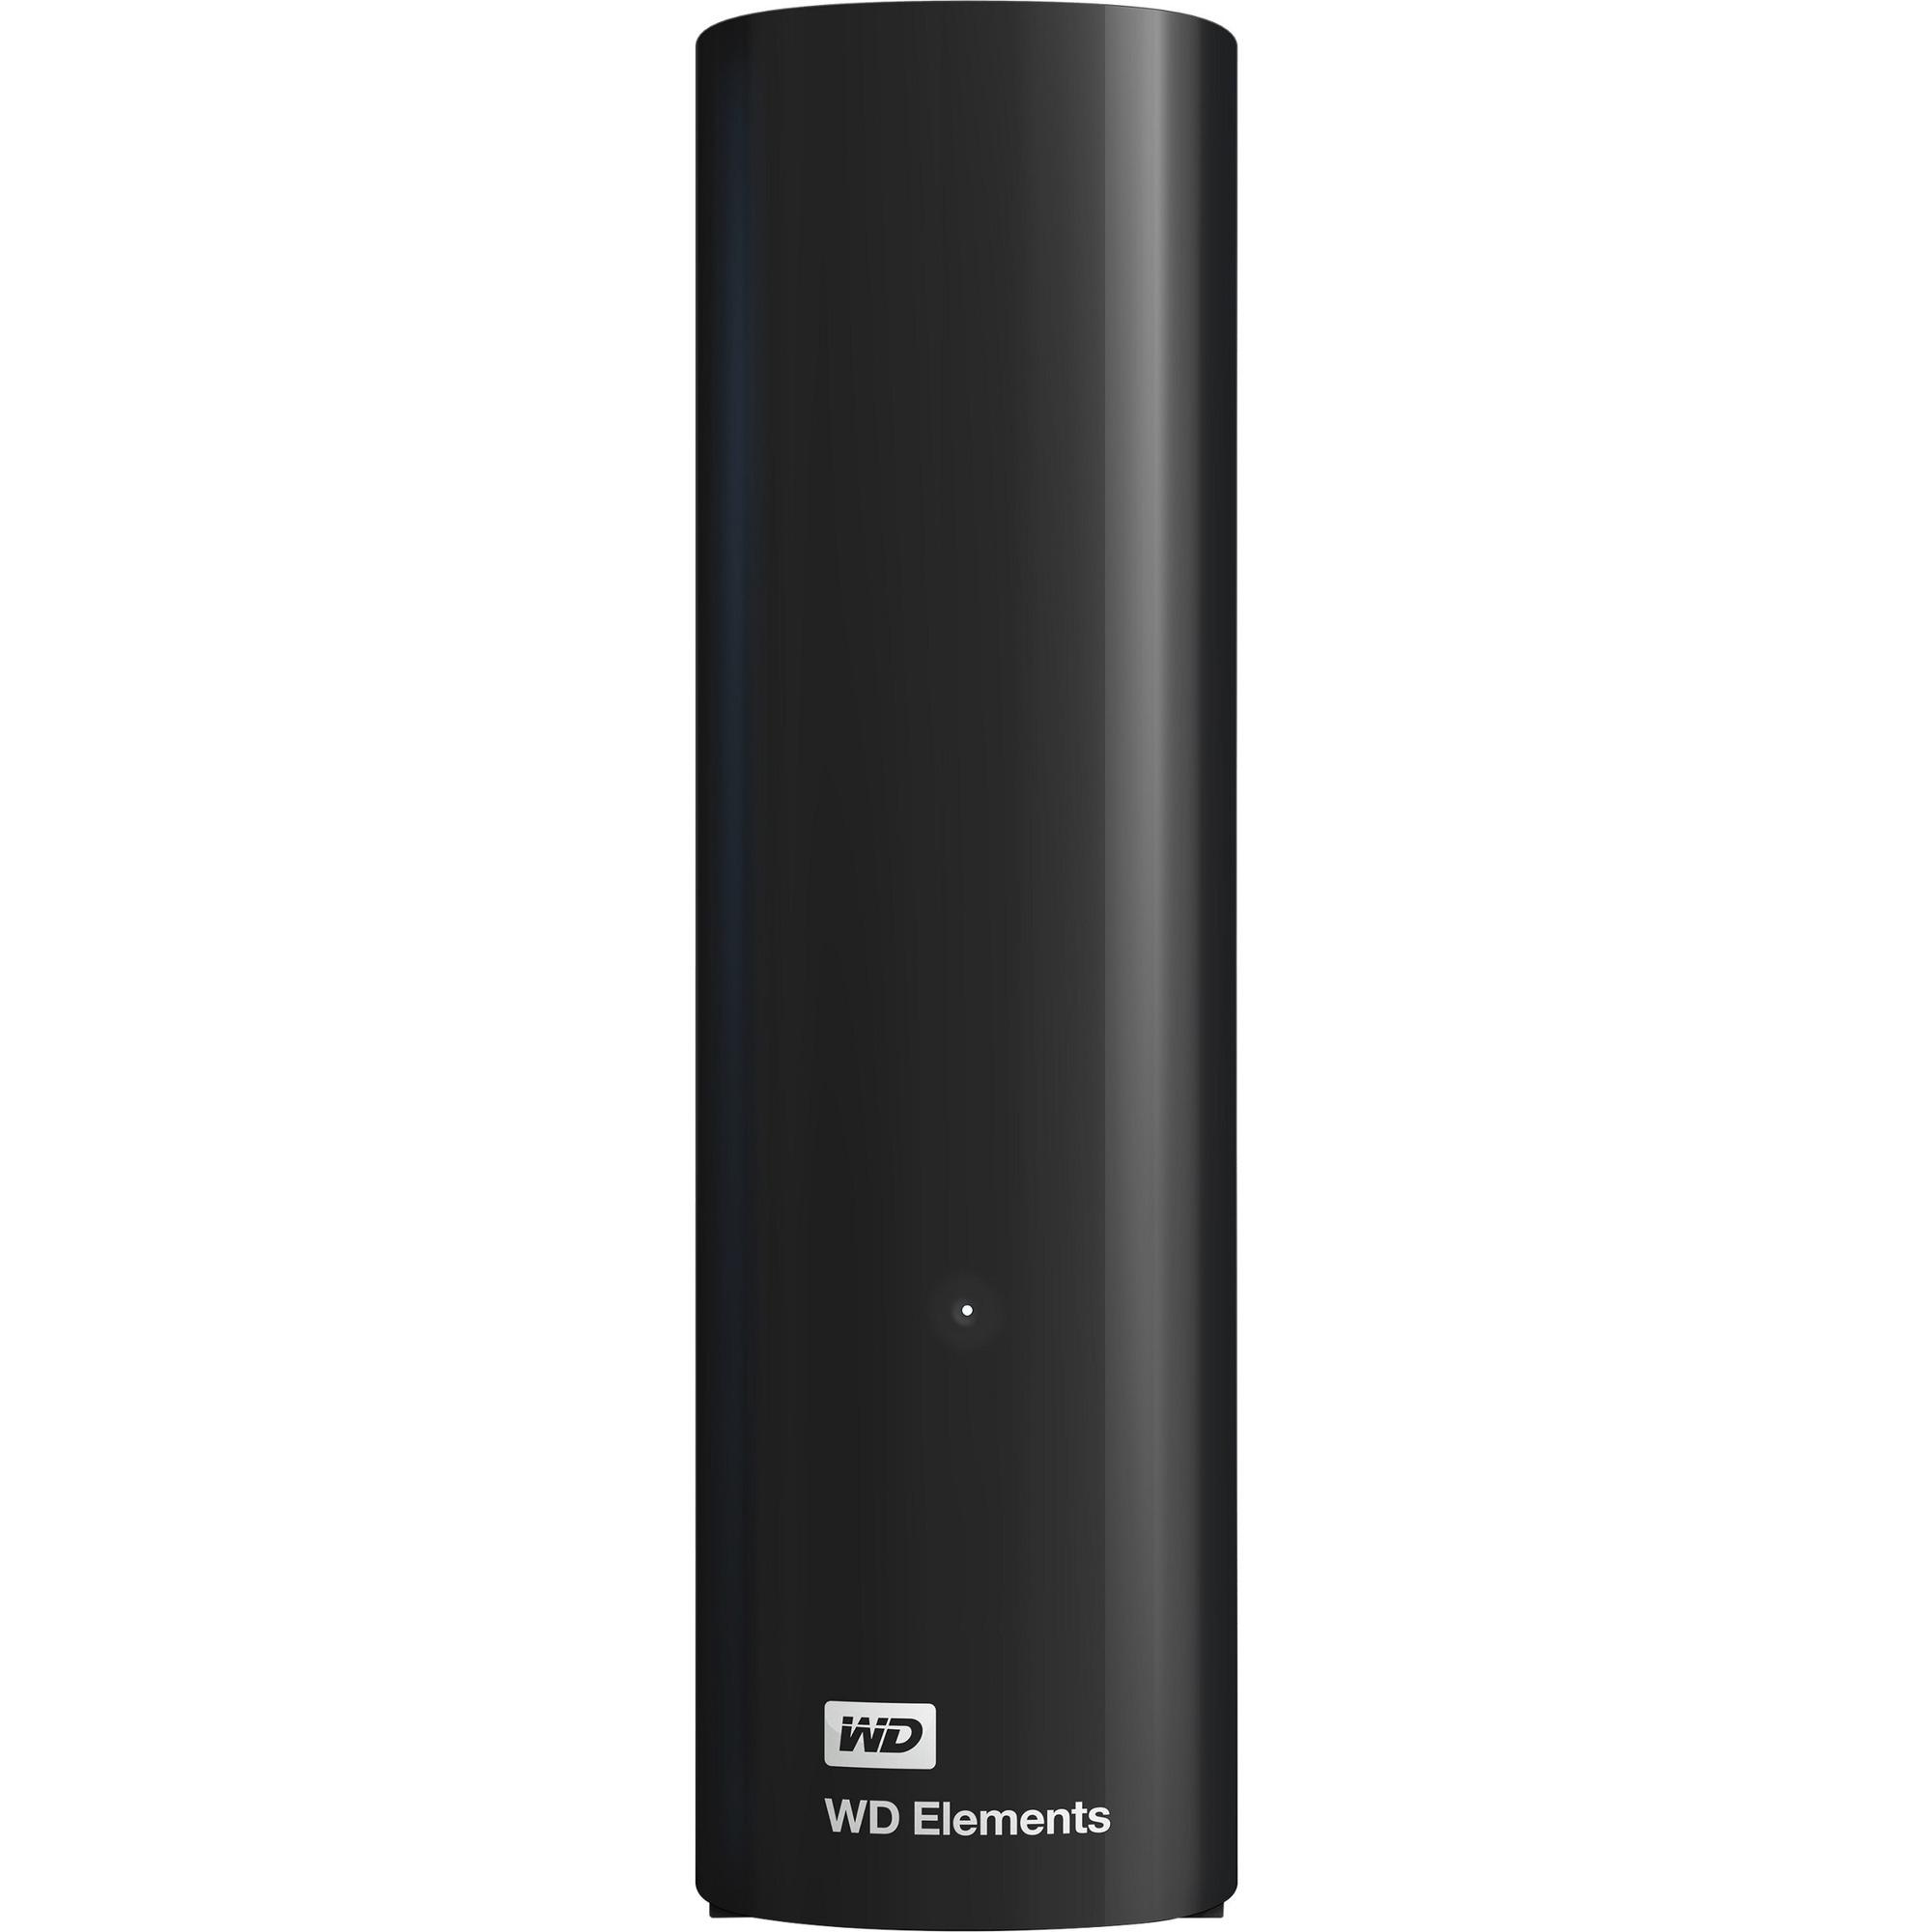 WD Elements WDBWLG0030HBK 3 TB External Hard Drive | Novatech